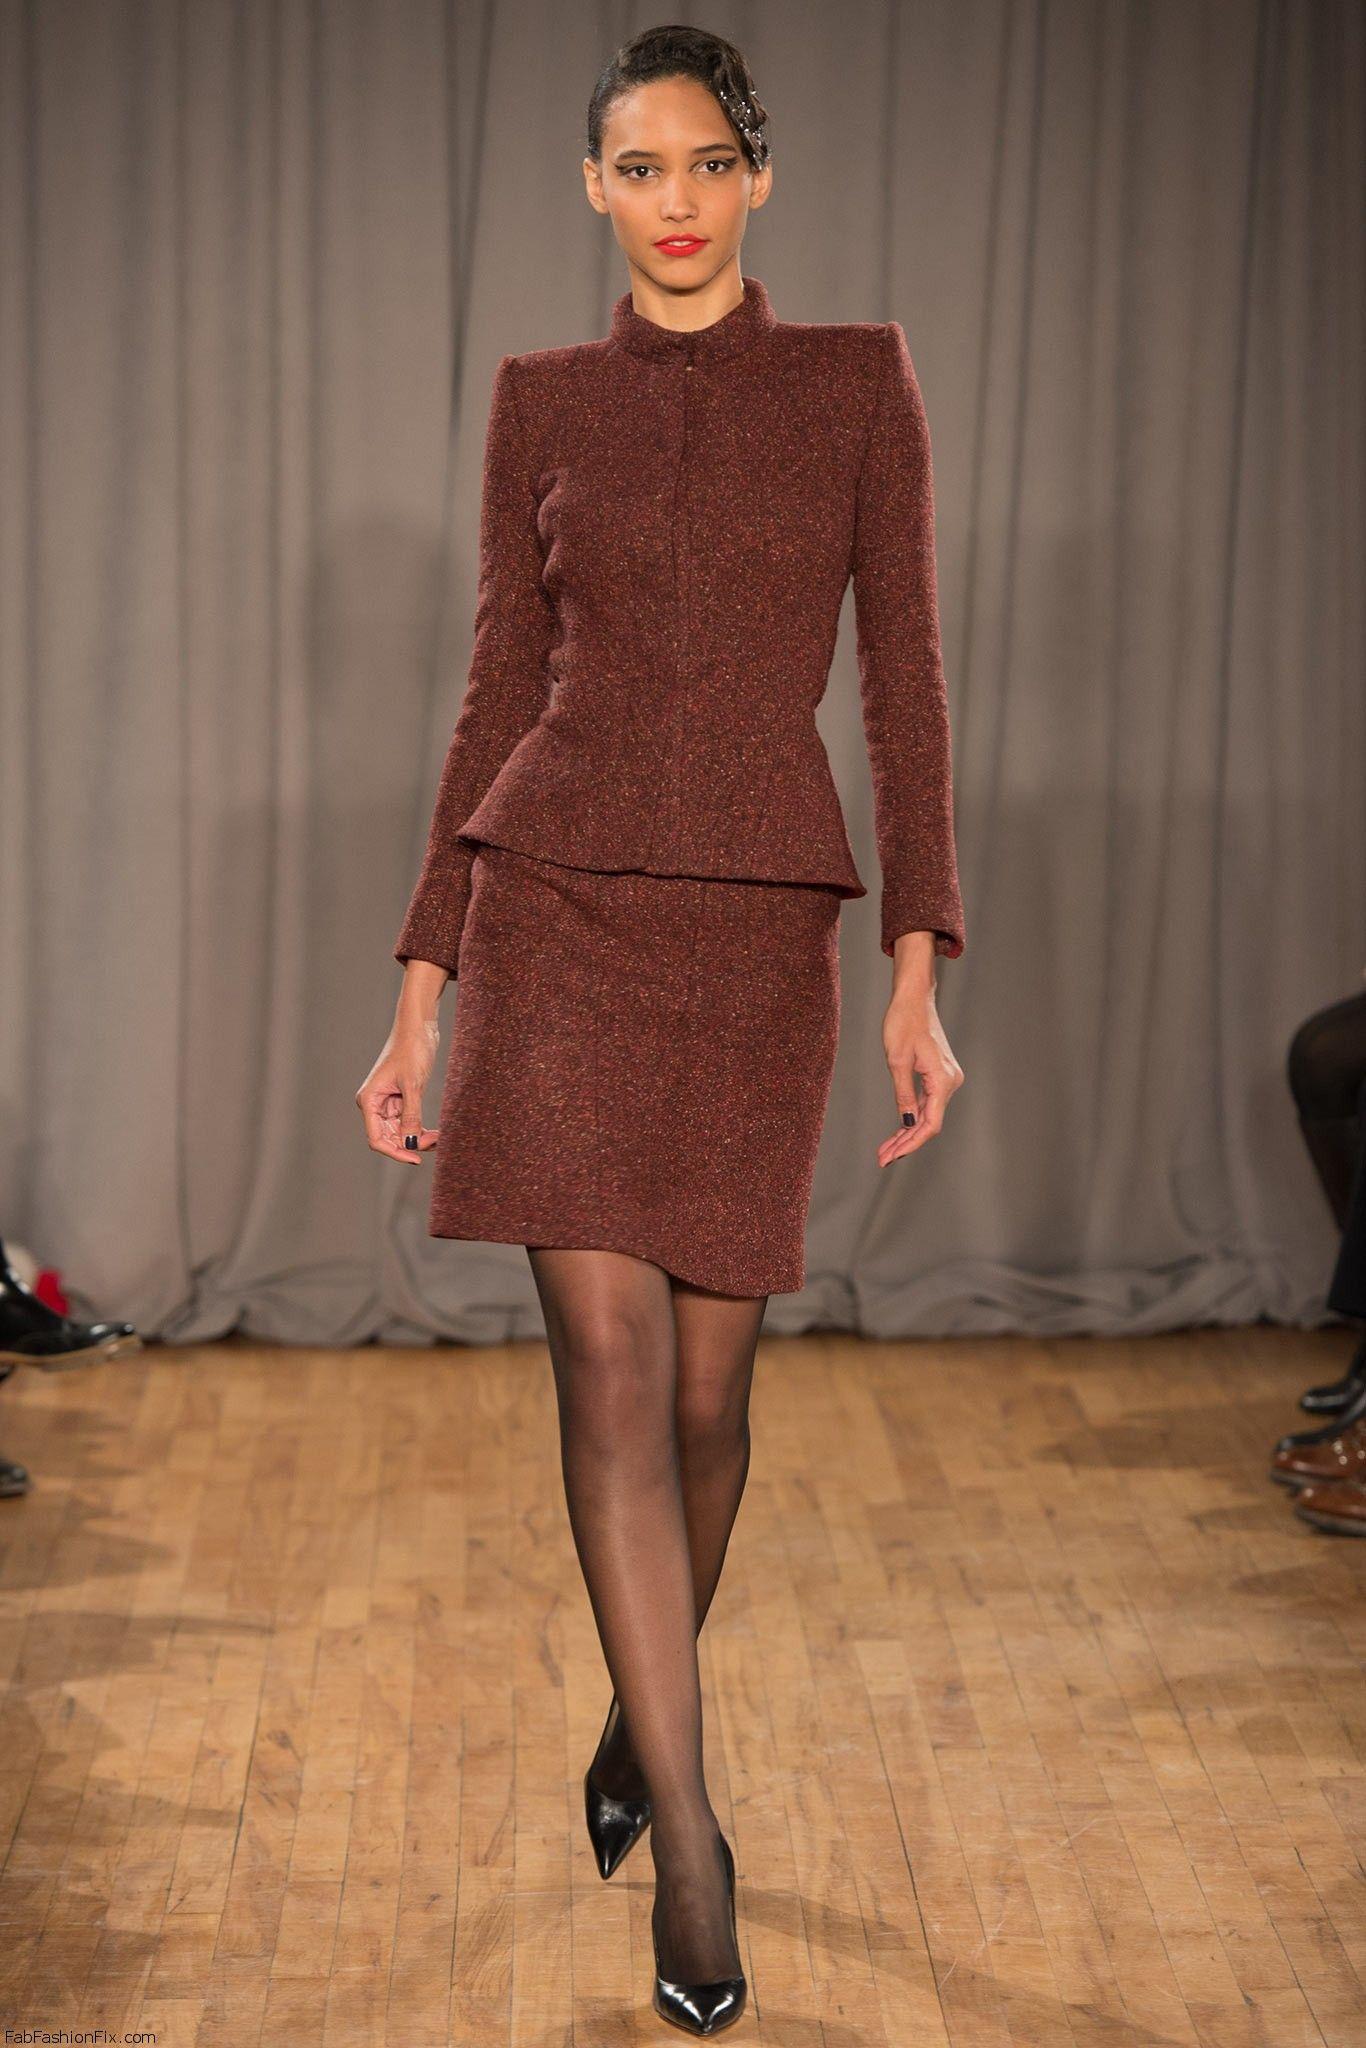 Zac Posen Fall Winter 2014 Collection New York Fashion